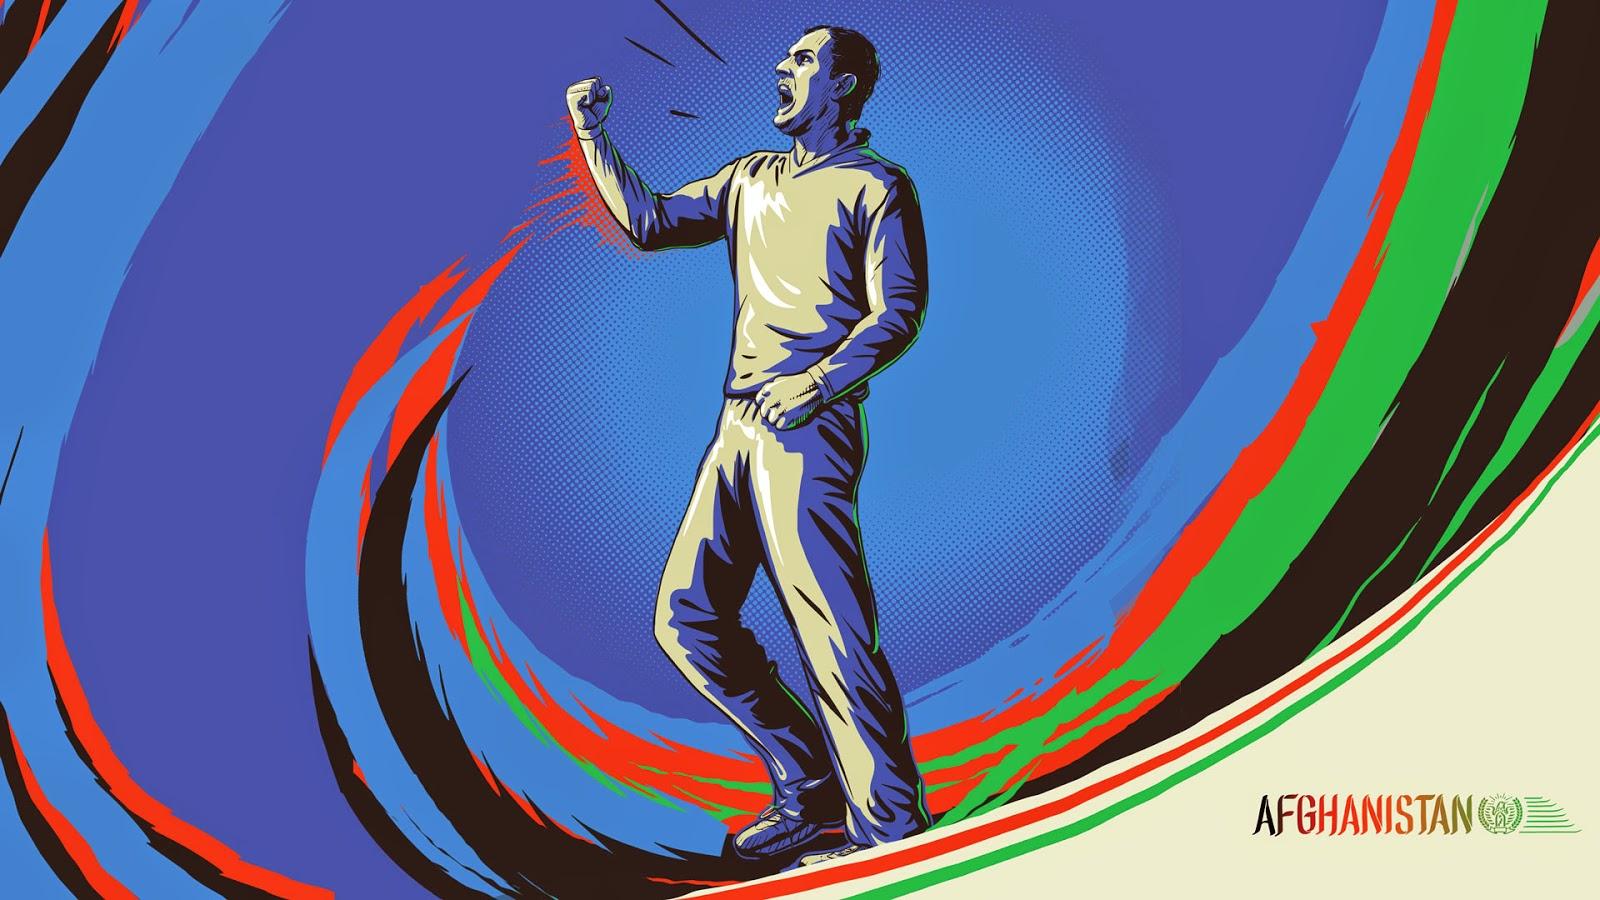 Mohammad Nabi Afghanistan cricketer illustration sketch